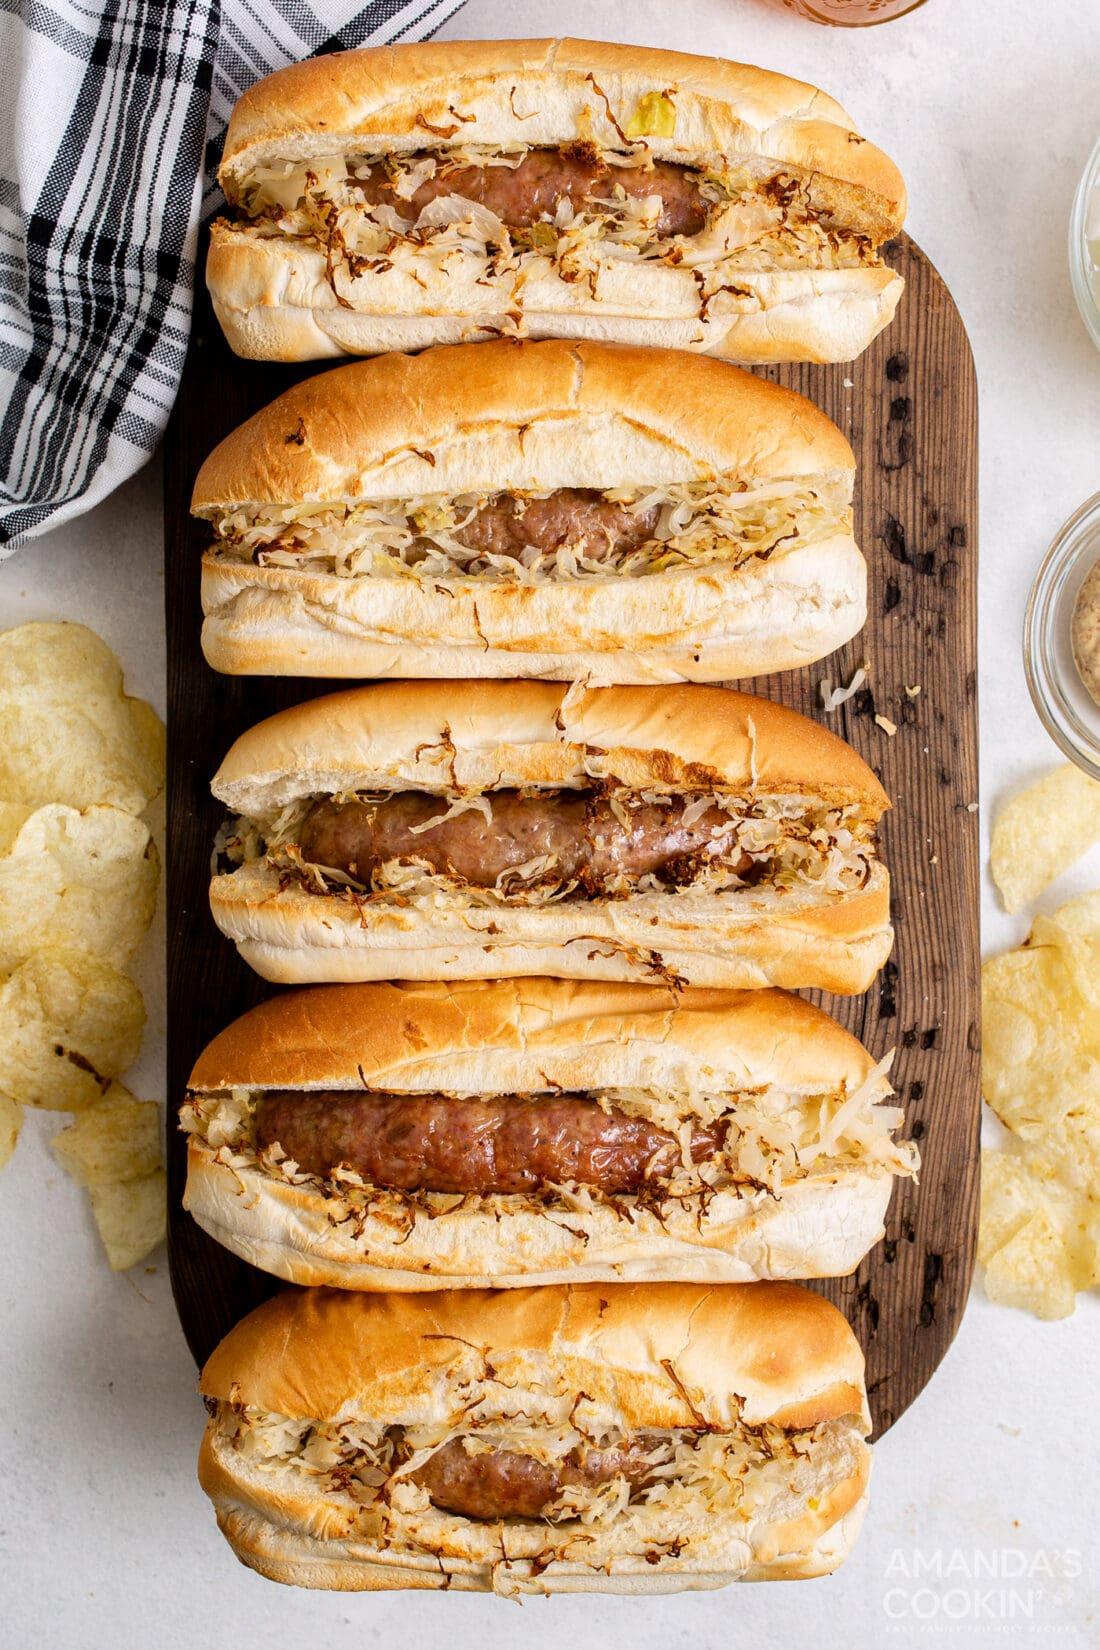 air fryer bratwurst in buns with sauerkraut on cutting board